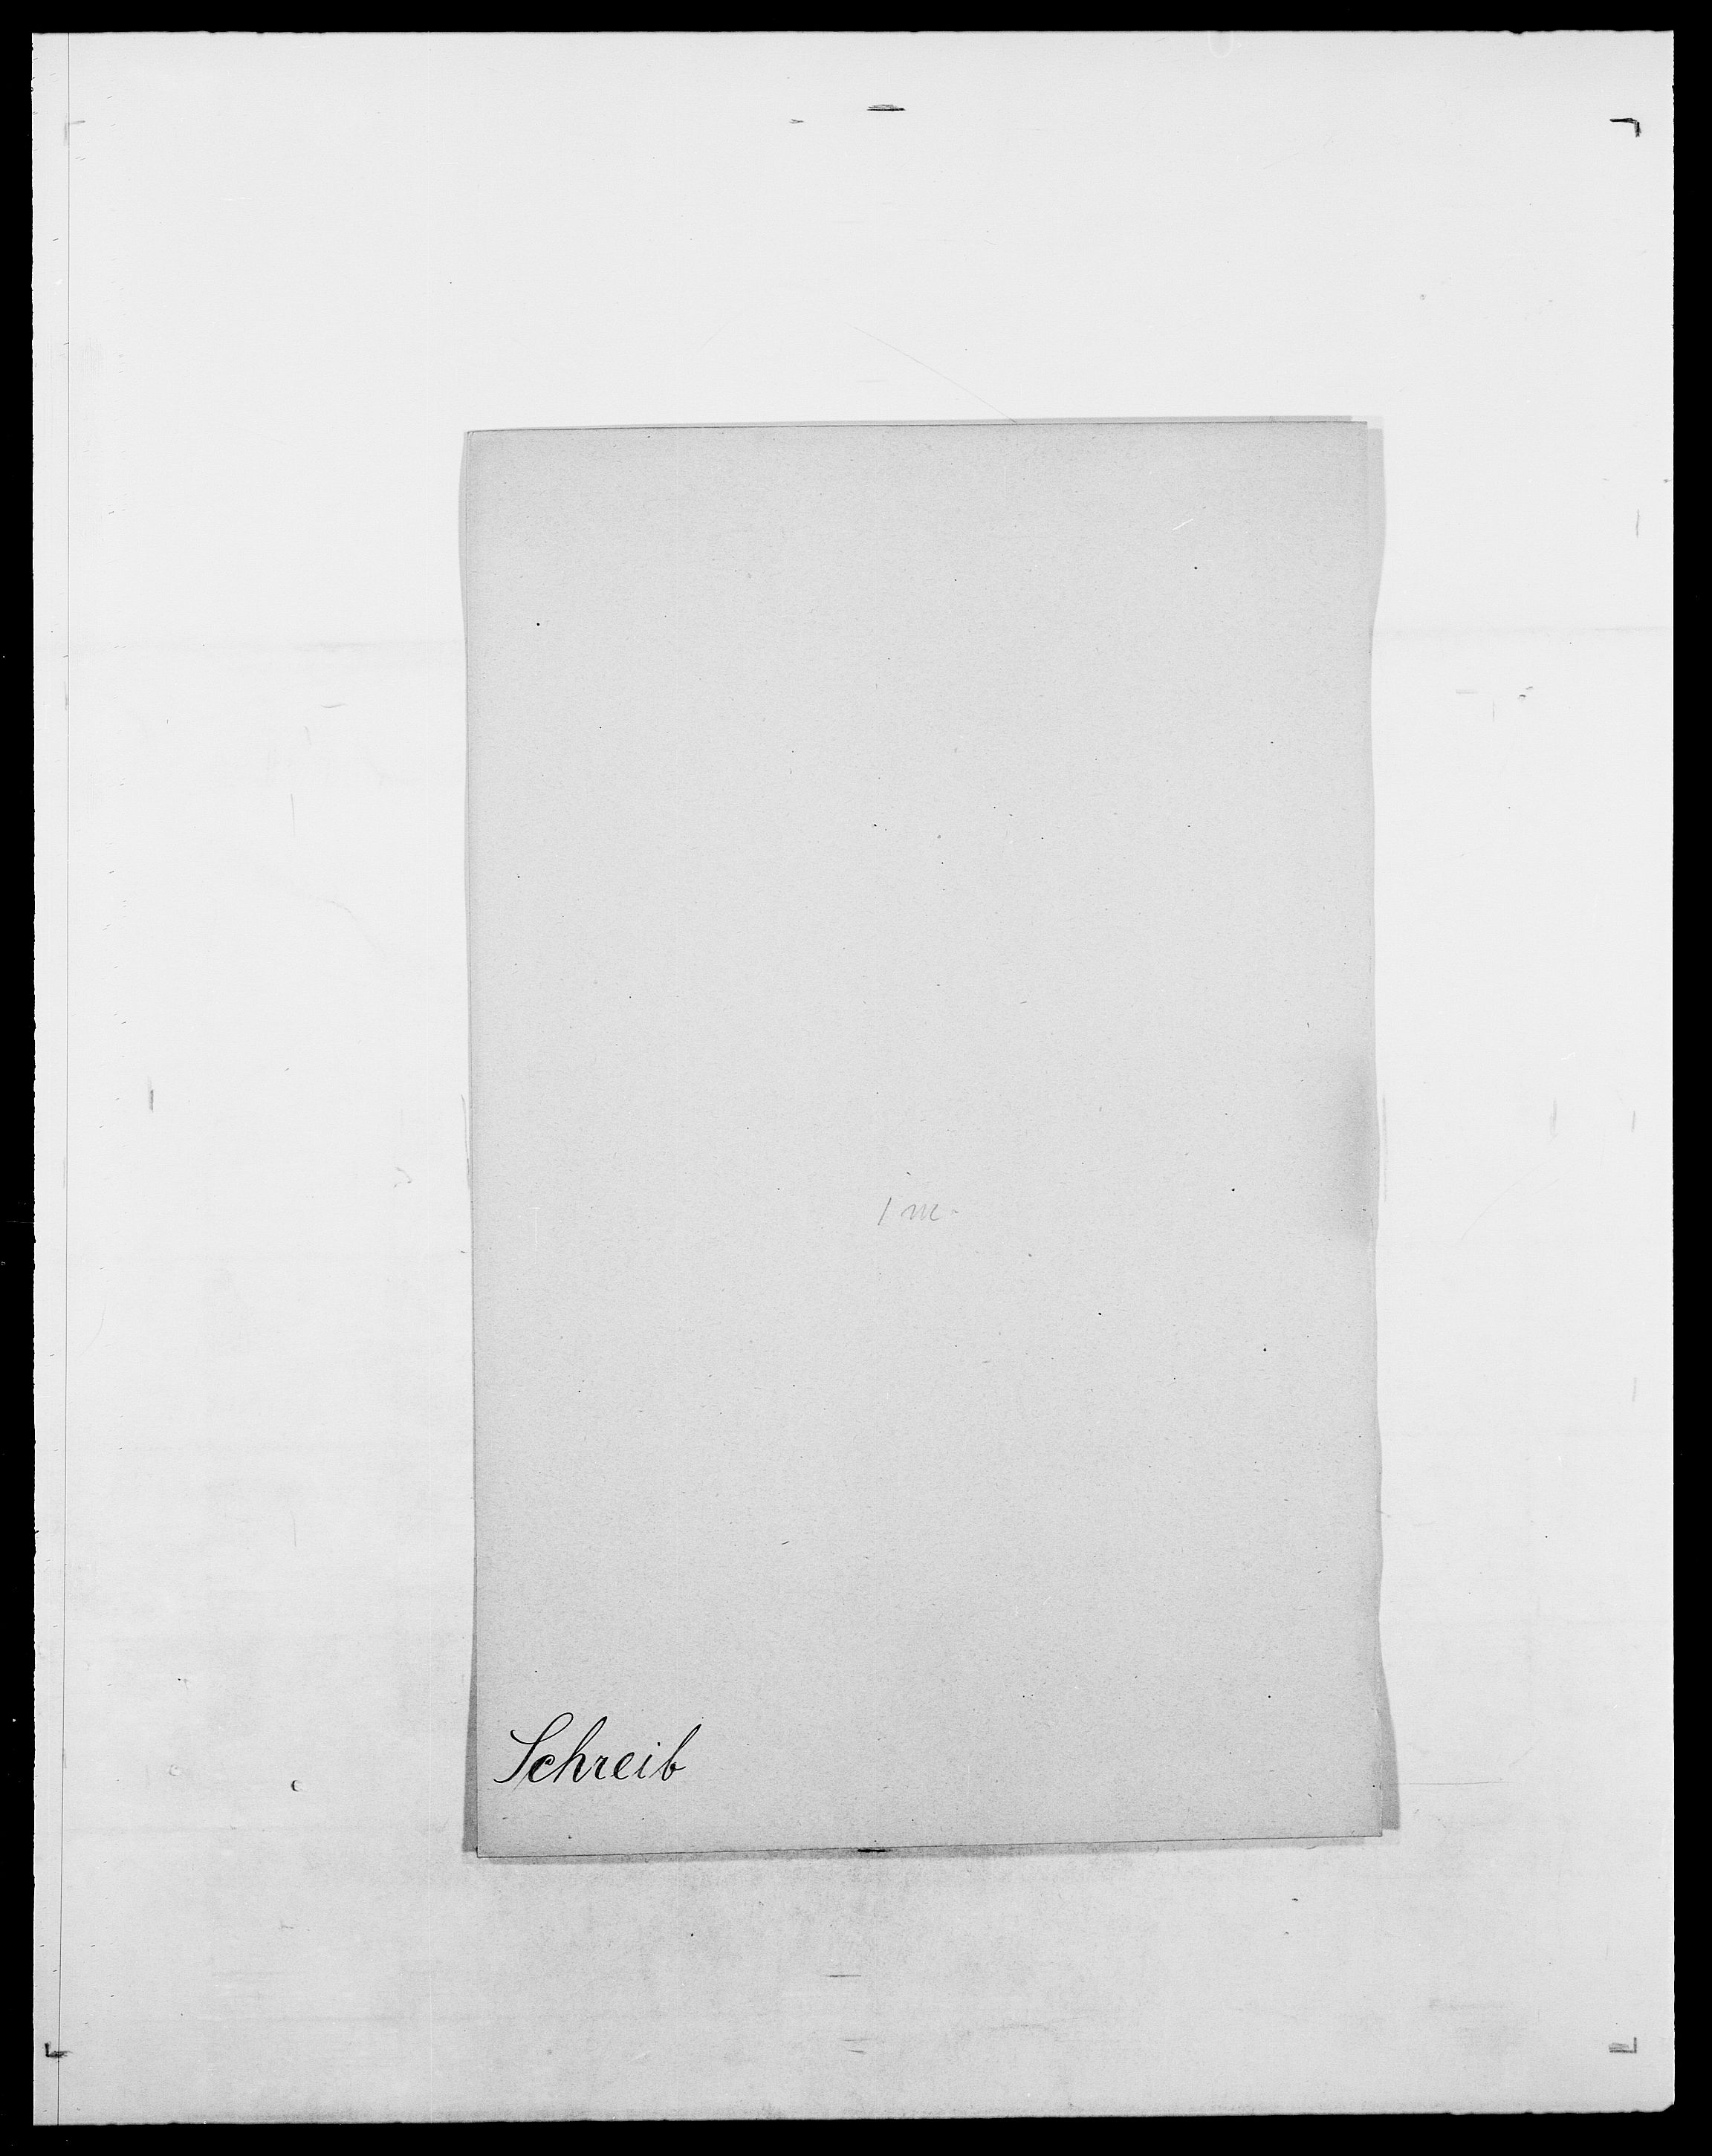 SAO, Delgobe, Charles Antoine - samling, D/Da/L0035: Schnabel - sjetman, s. 139